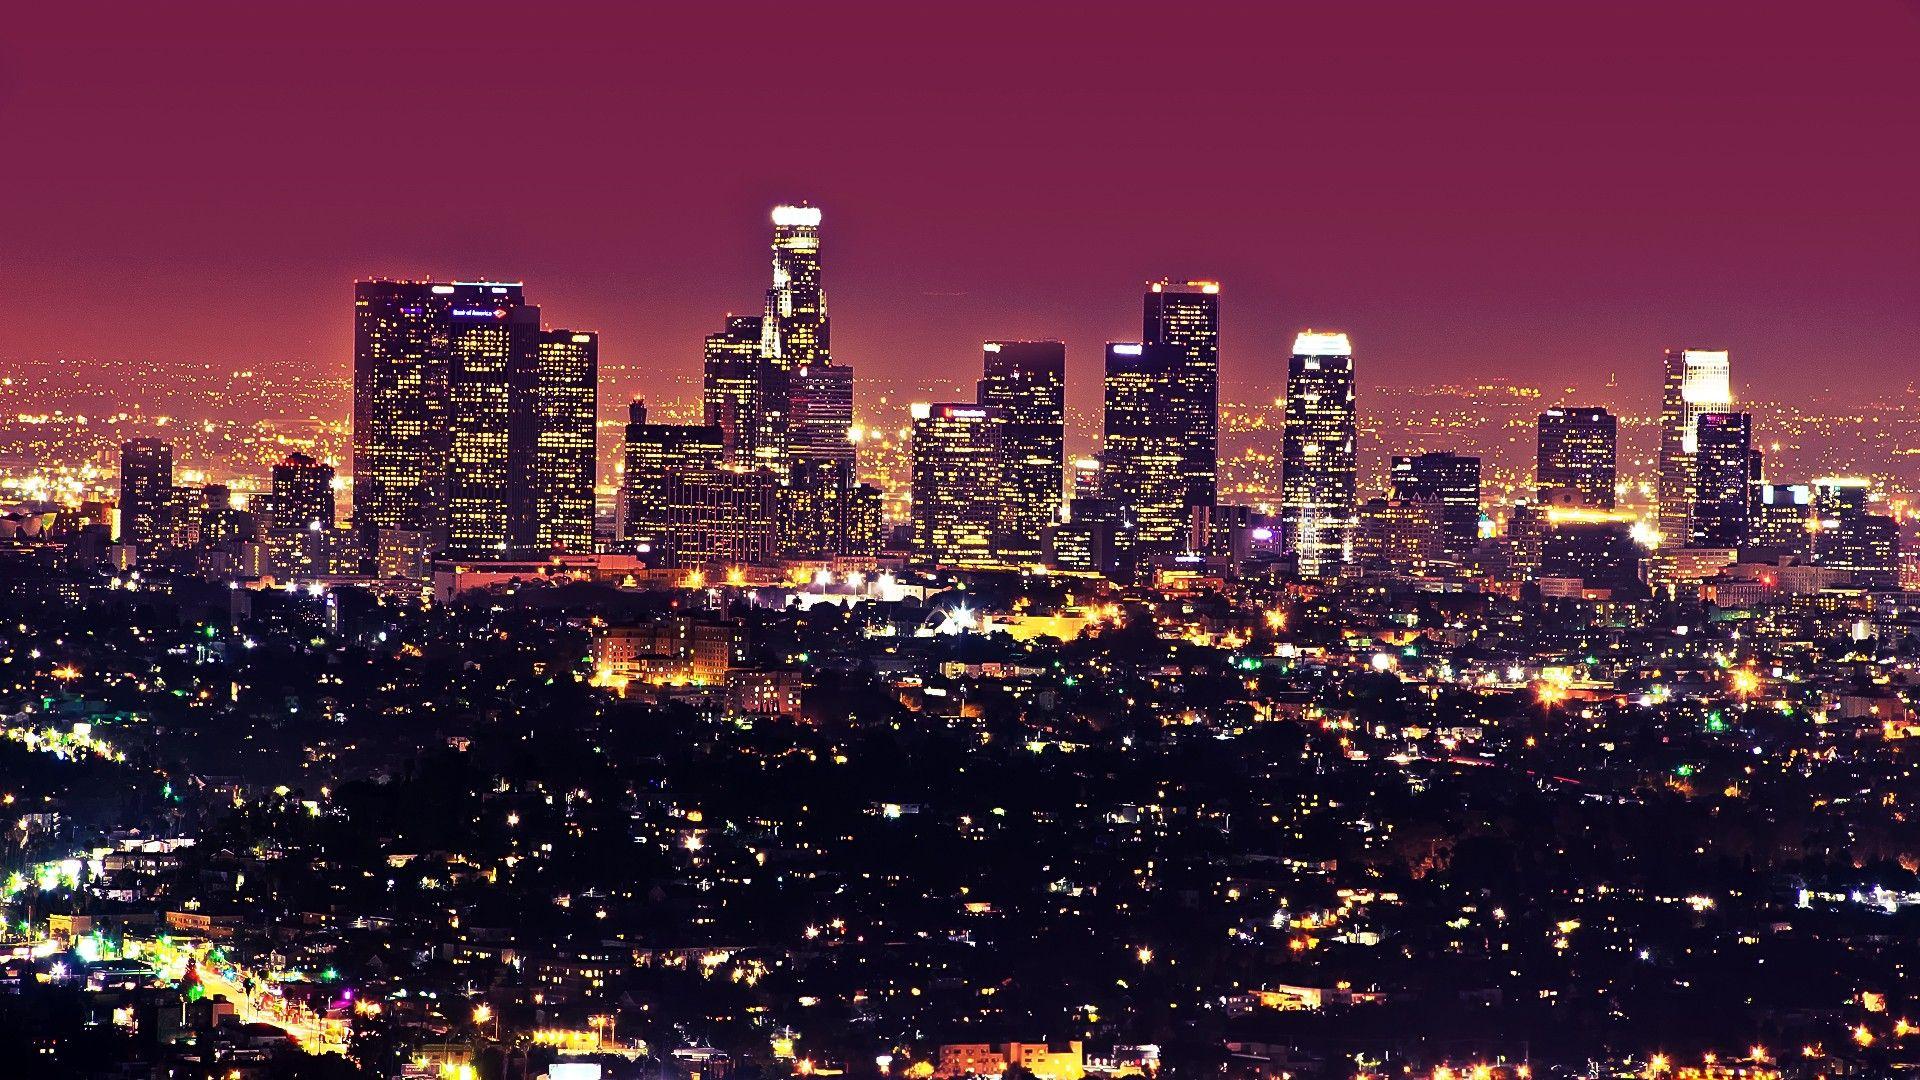 beautiful los angeles city at night lights landscape